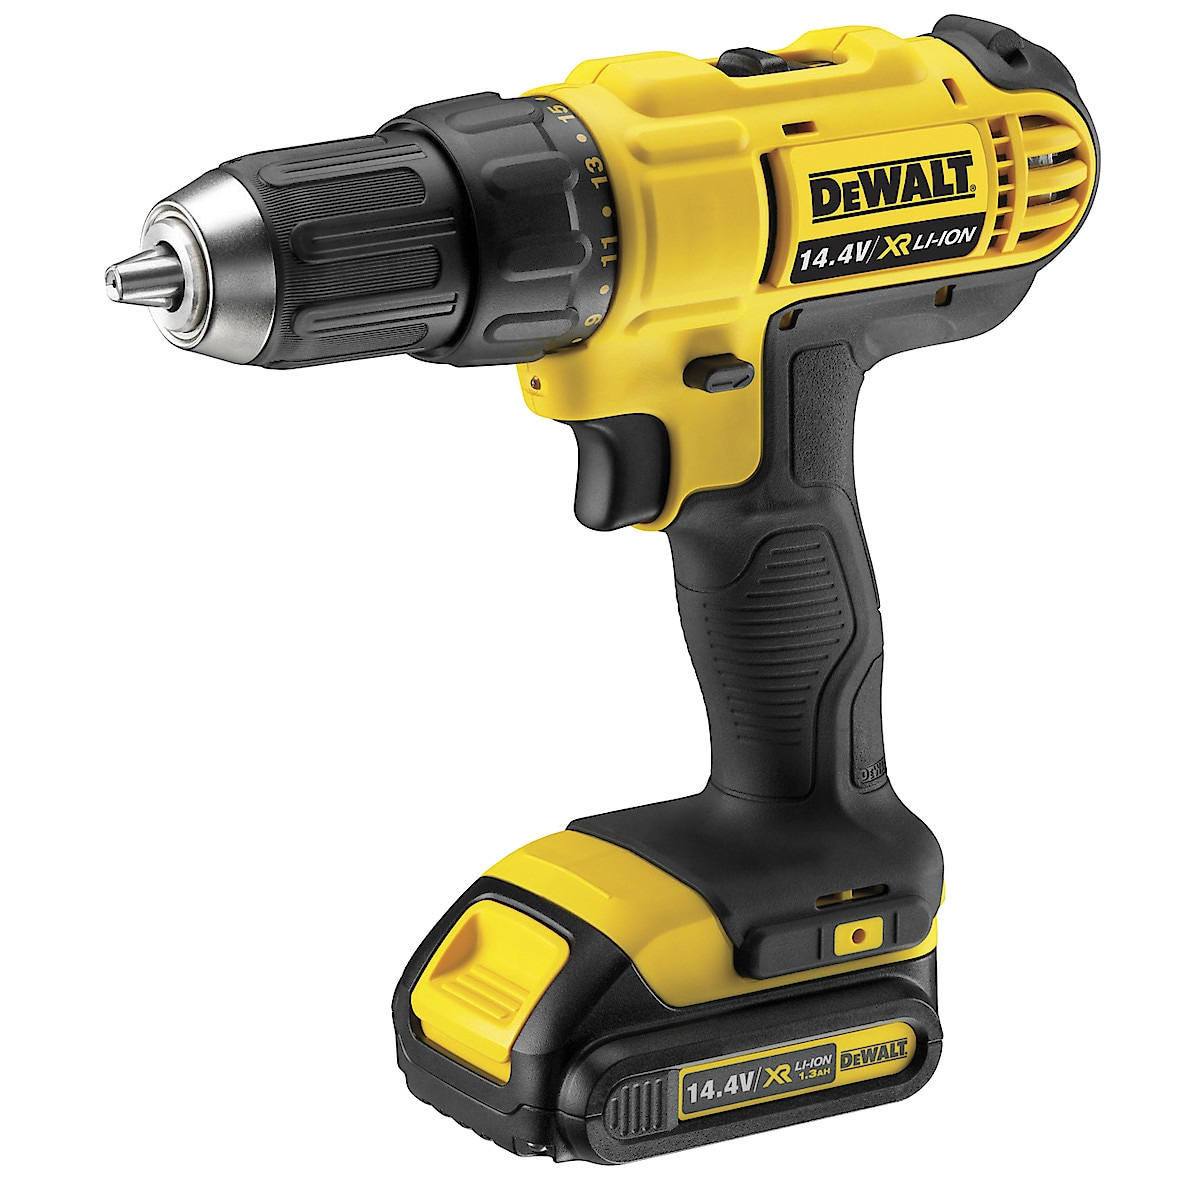 Dewalt DCD734C2-QW drill/skrutrekker